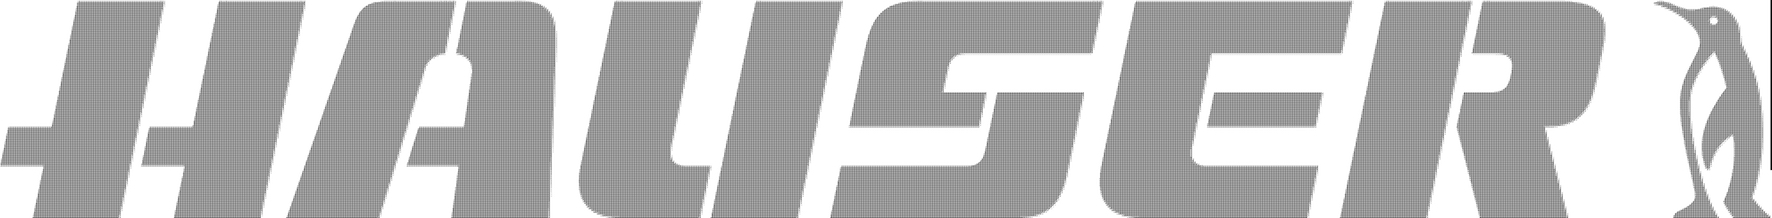 Hauser_Logo_11.11.15.jpg-4x4-Dither_0